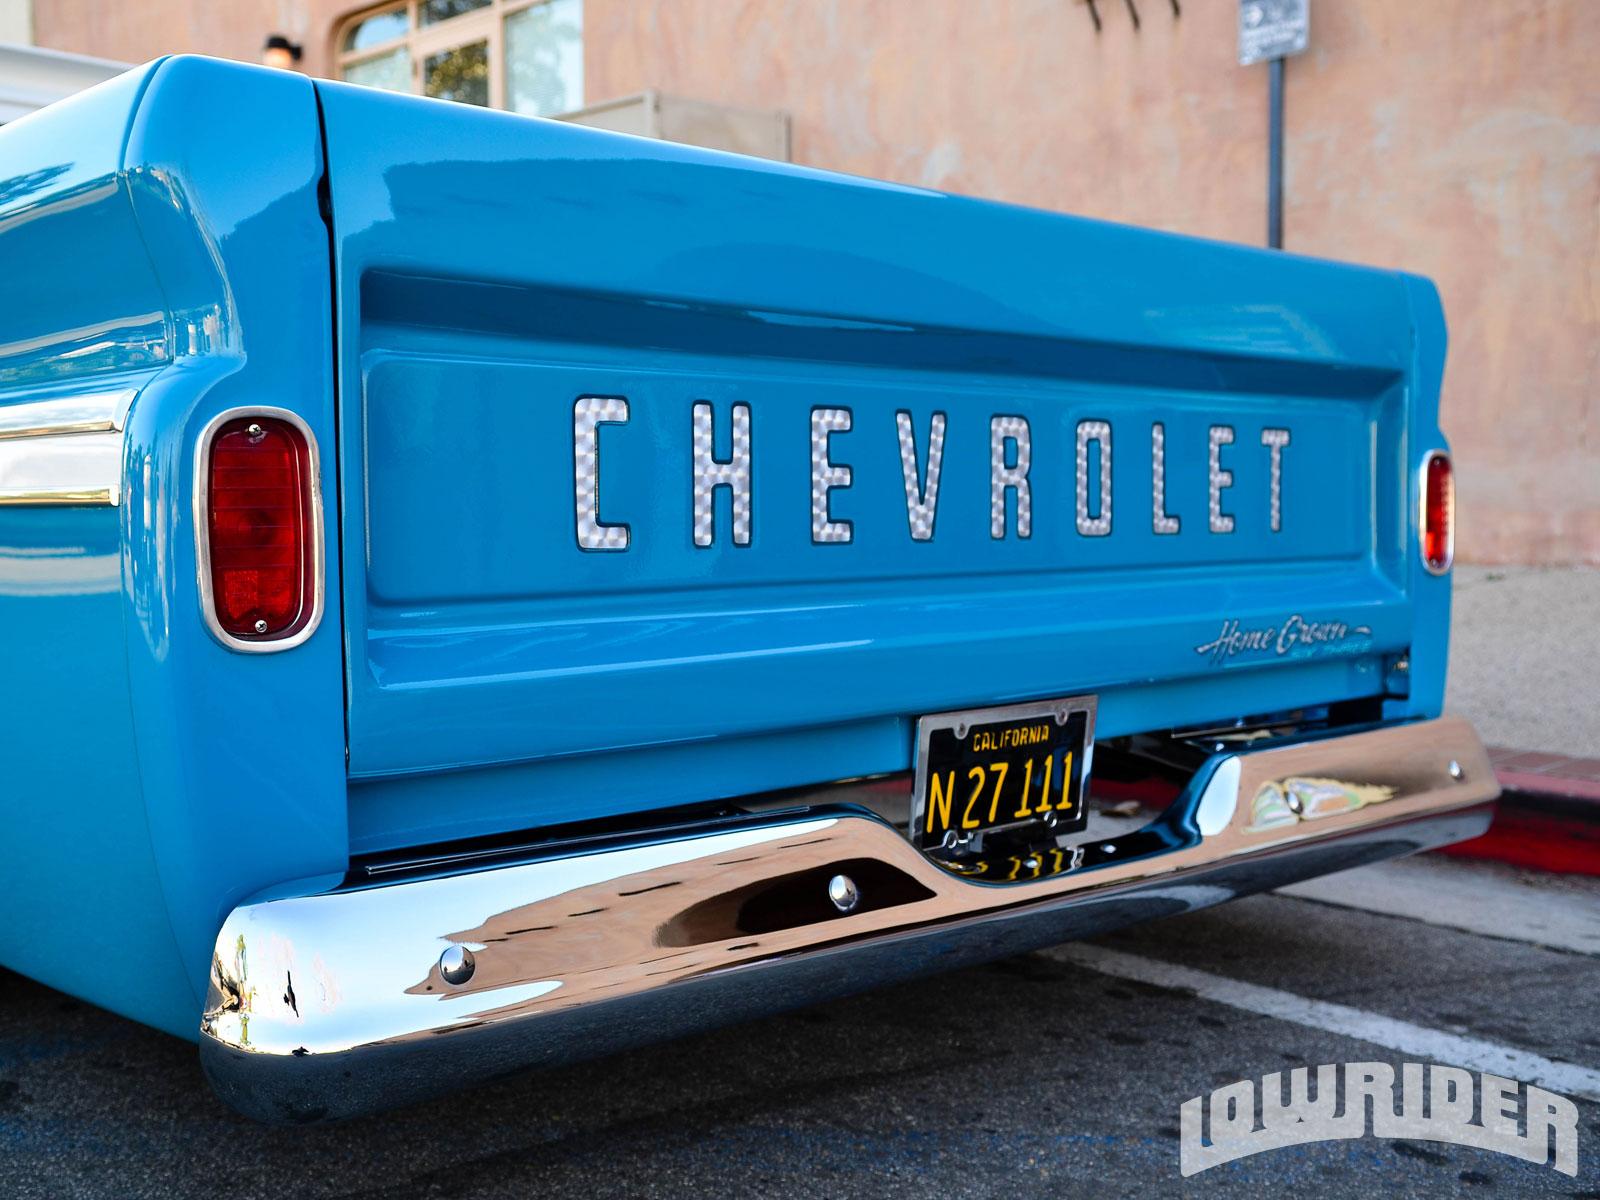 1963 Chevrolet Truck - Lowrider Magazine